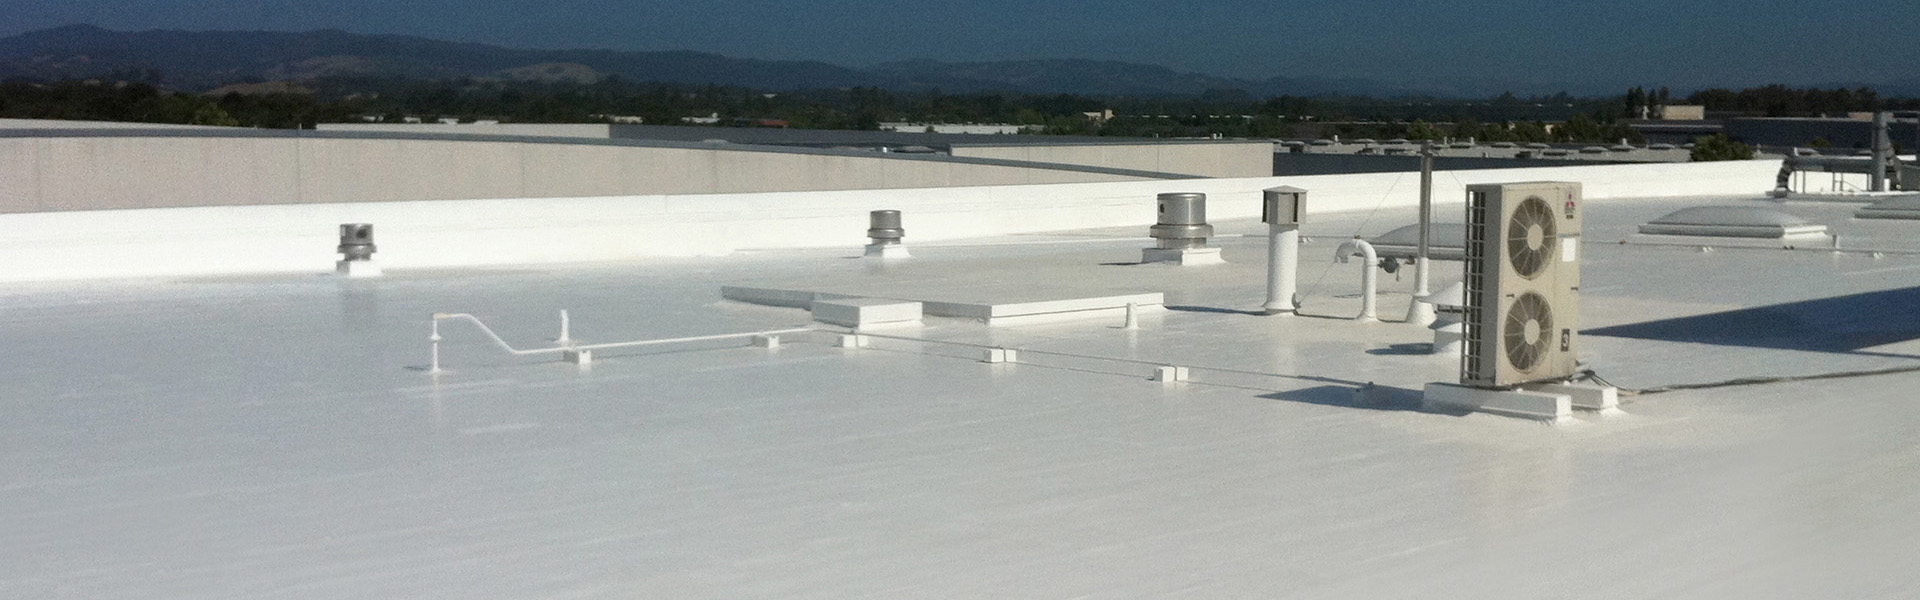 Spray foam insulation san antonio spray roof coating san antonio commercial roofing san antonio TPO roofing san antonio PVC roofing san antonio